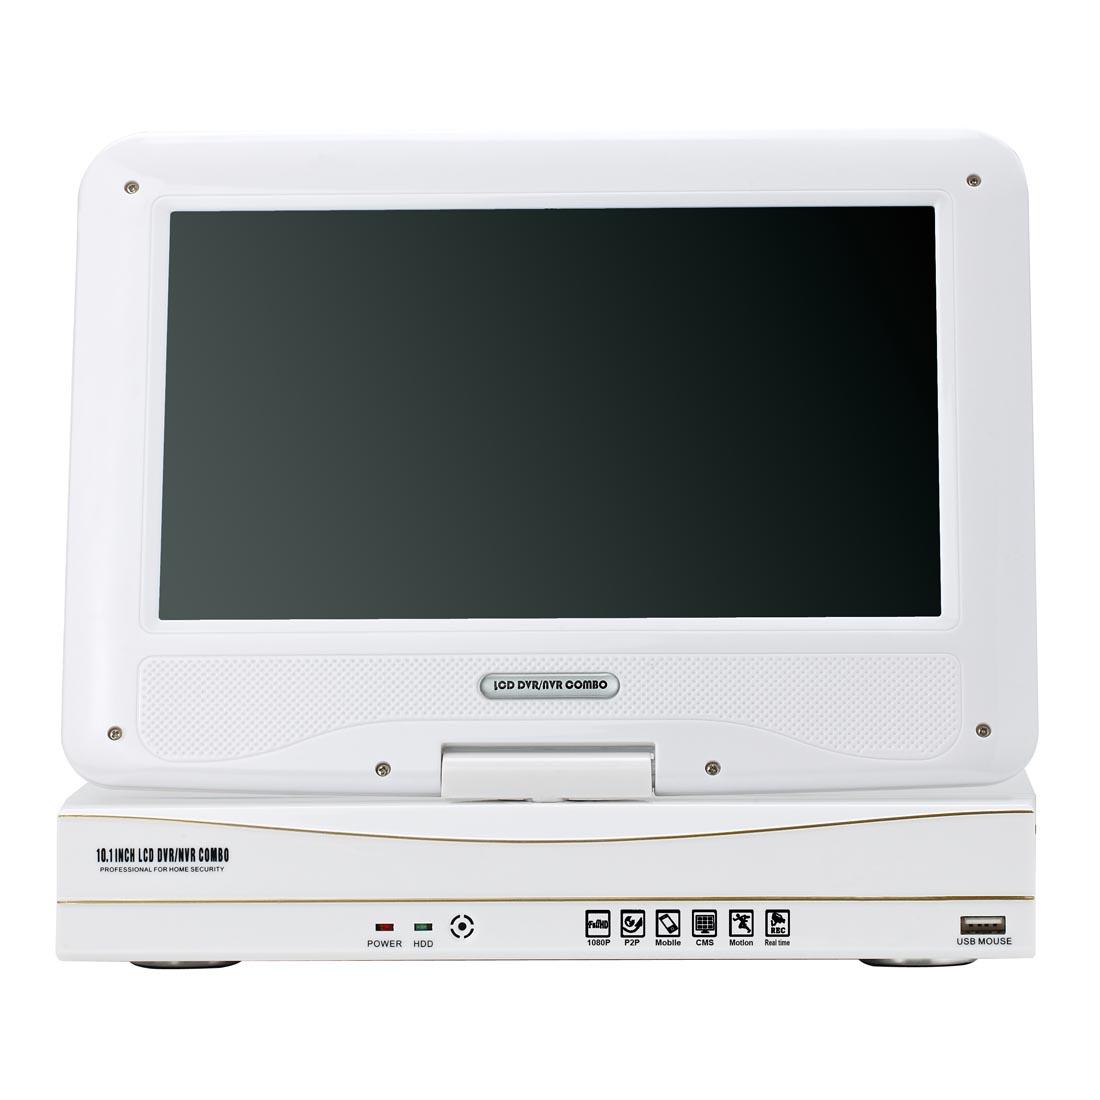 Nvr network video recorder(nvr 6810-a2 w)